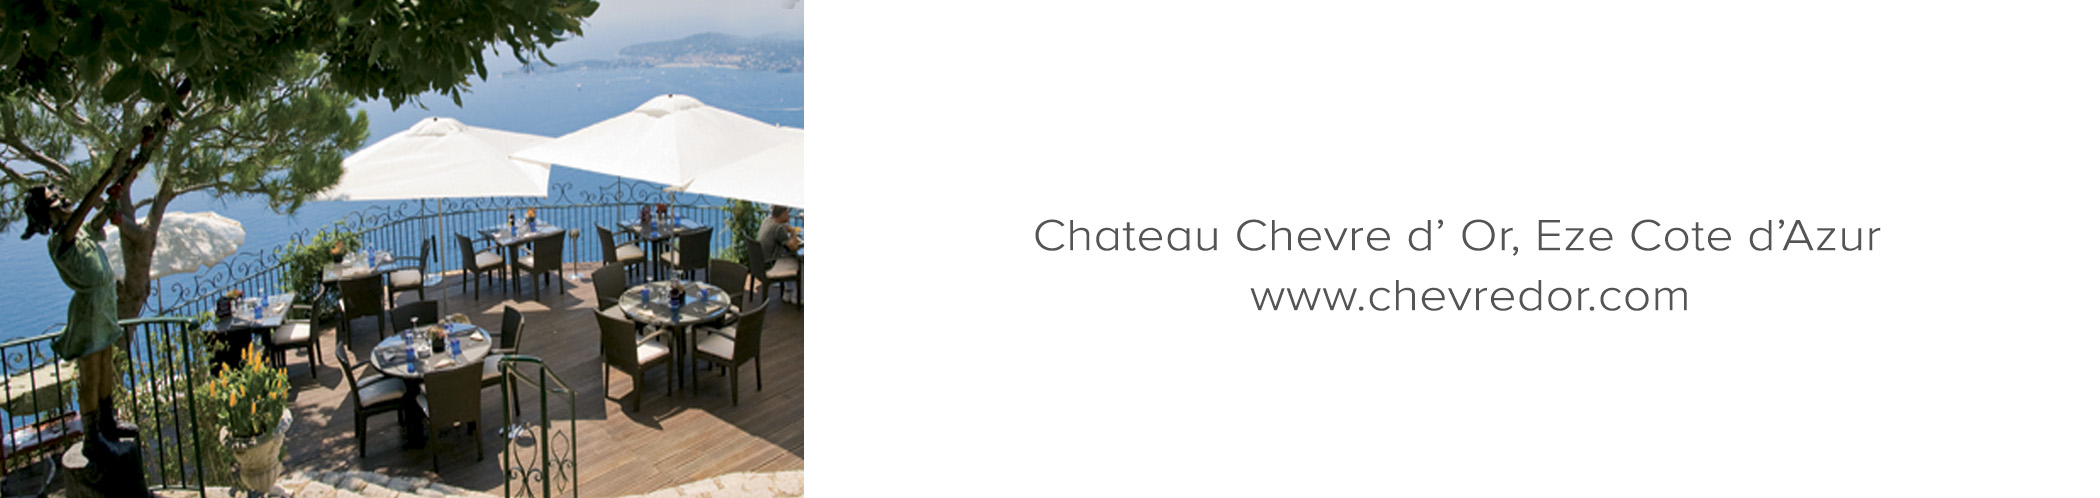 www.chevredor.com.jpg